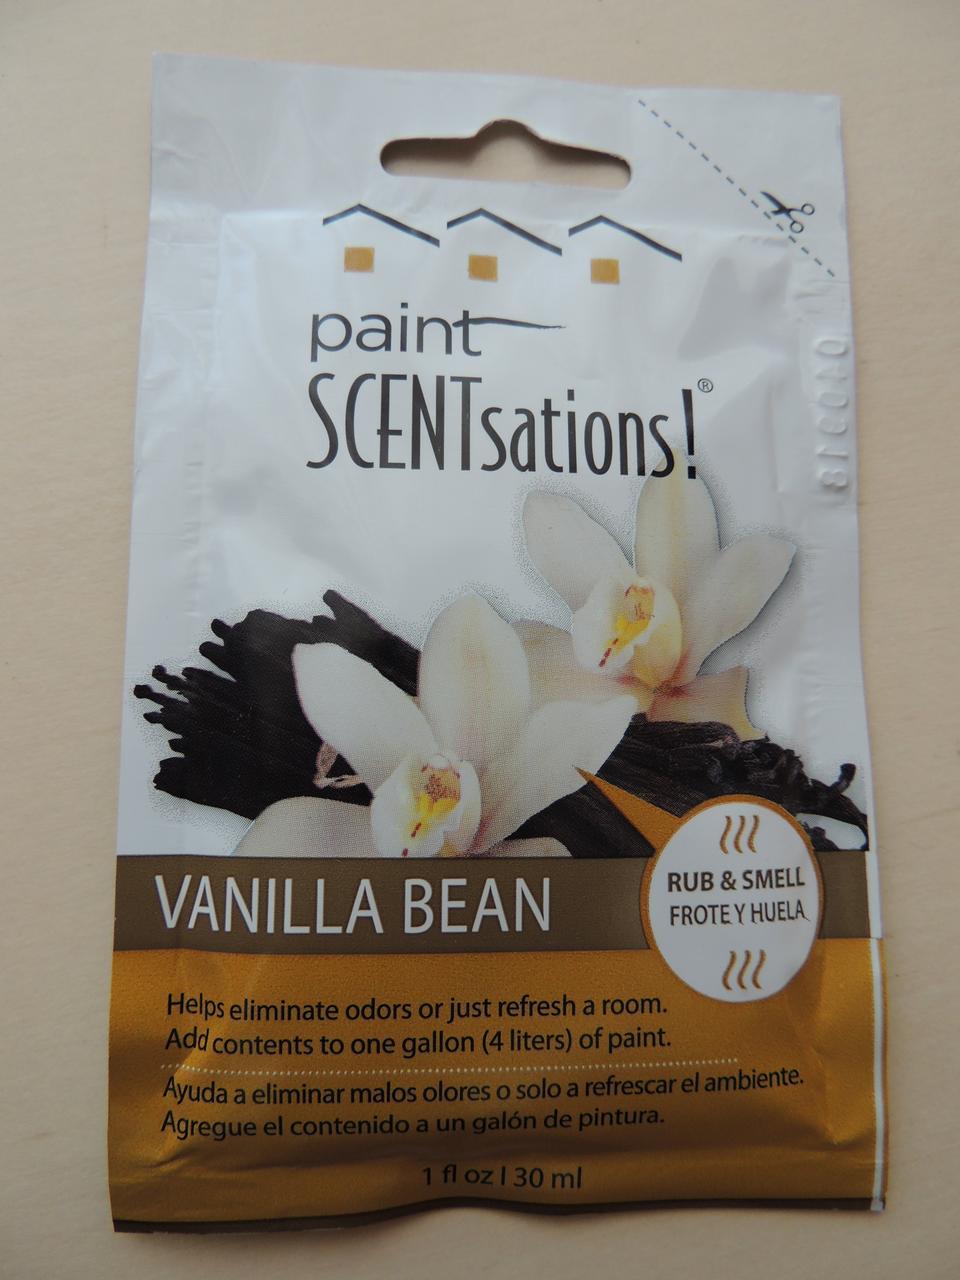 Paint SCENTsations ароматизована добавка до фарби Vanilla Bean (Ваніль)